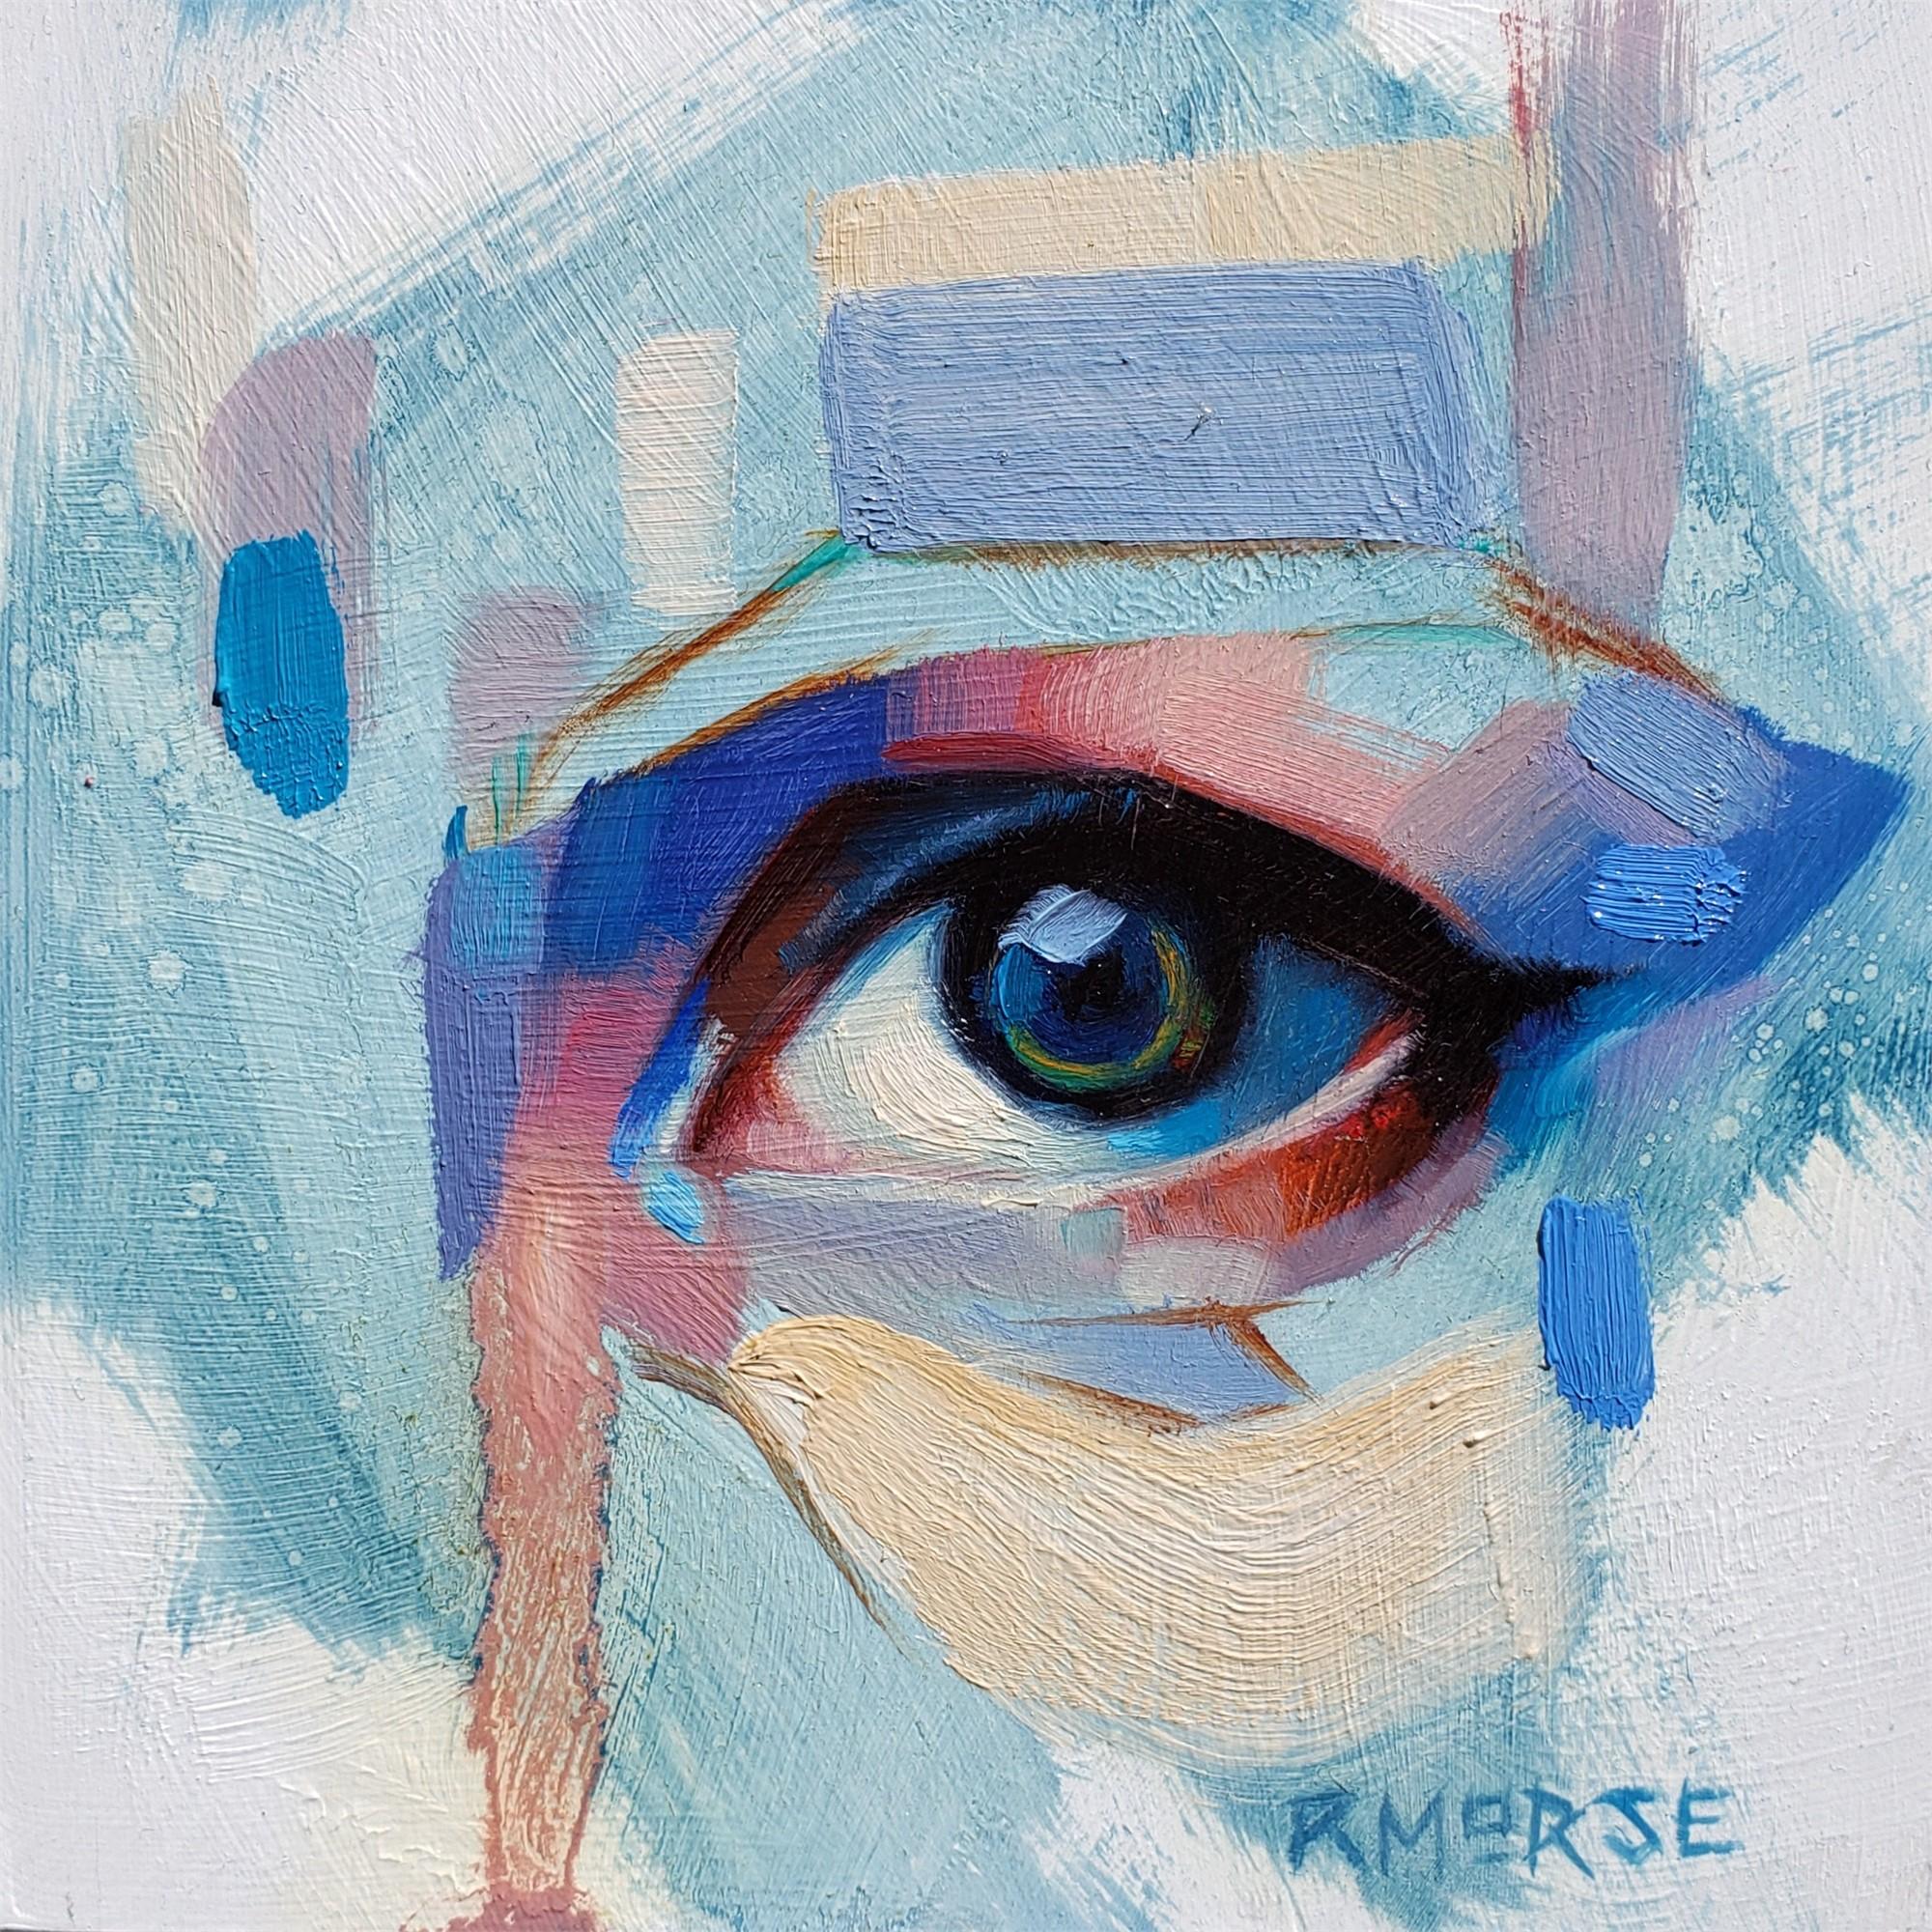 Blue Light by Ryan Morse